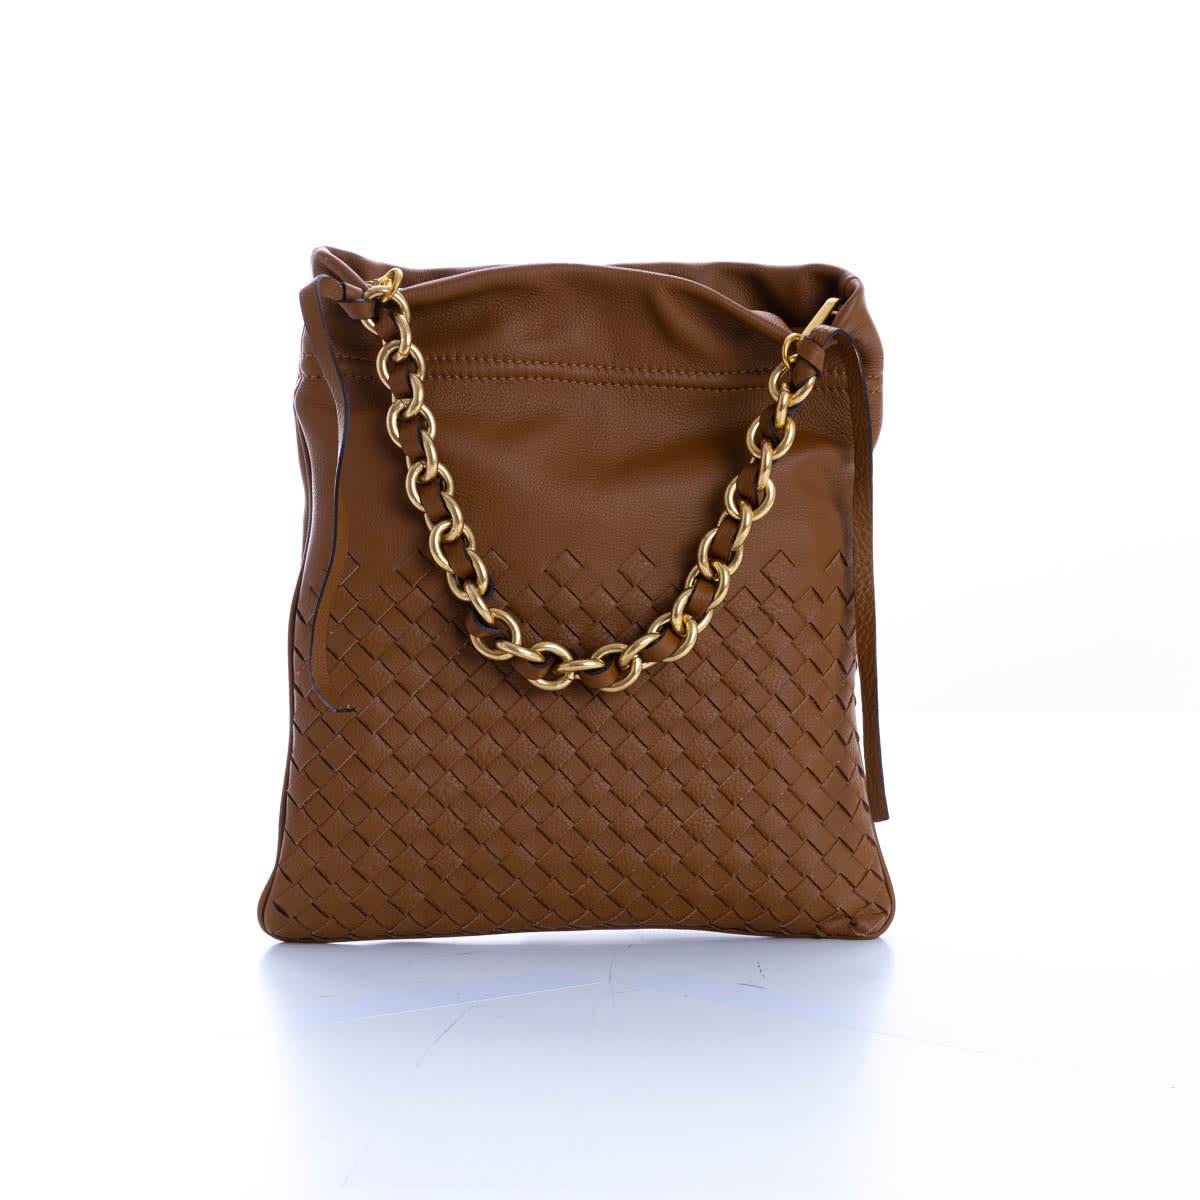 Gianni Chiarini Gianni Chiarini memory Leather Bag